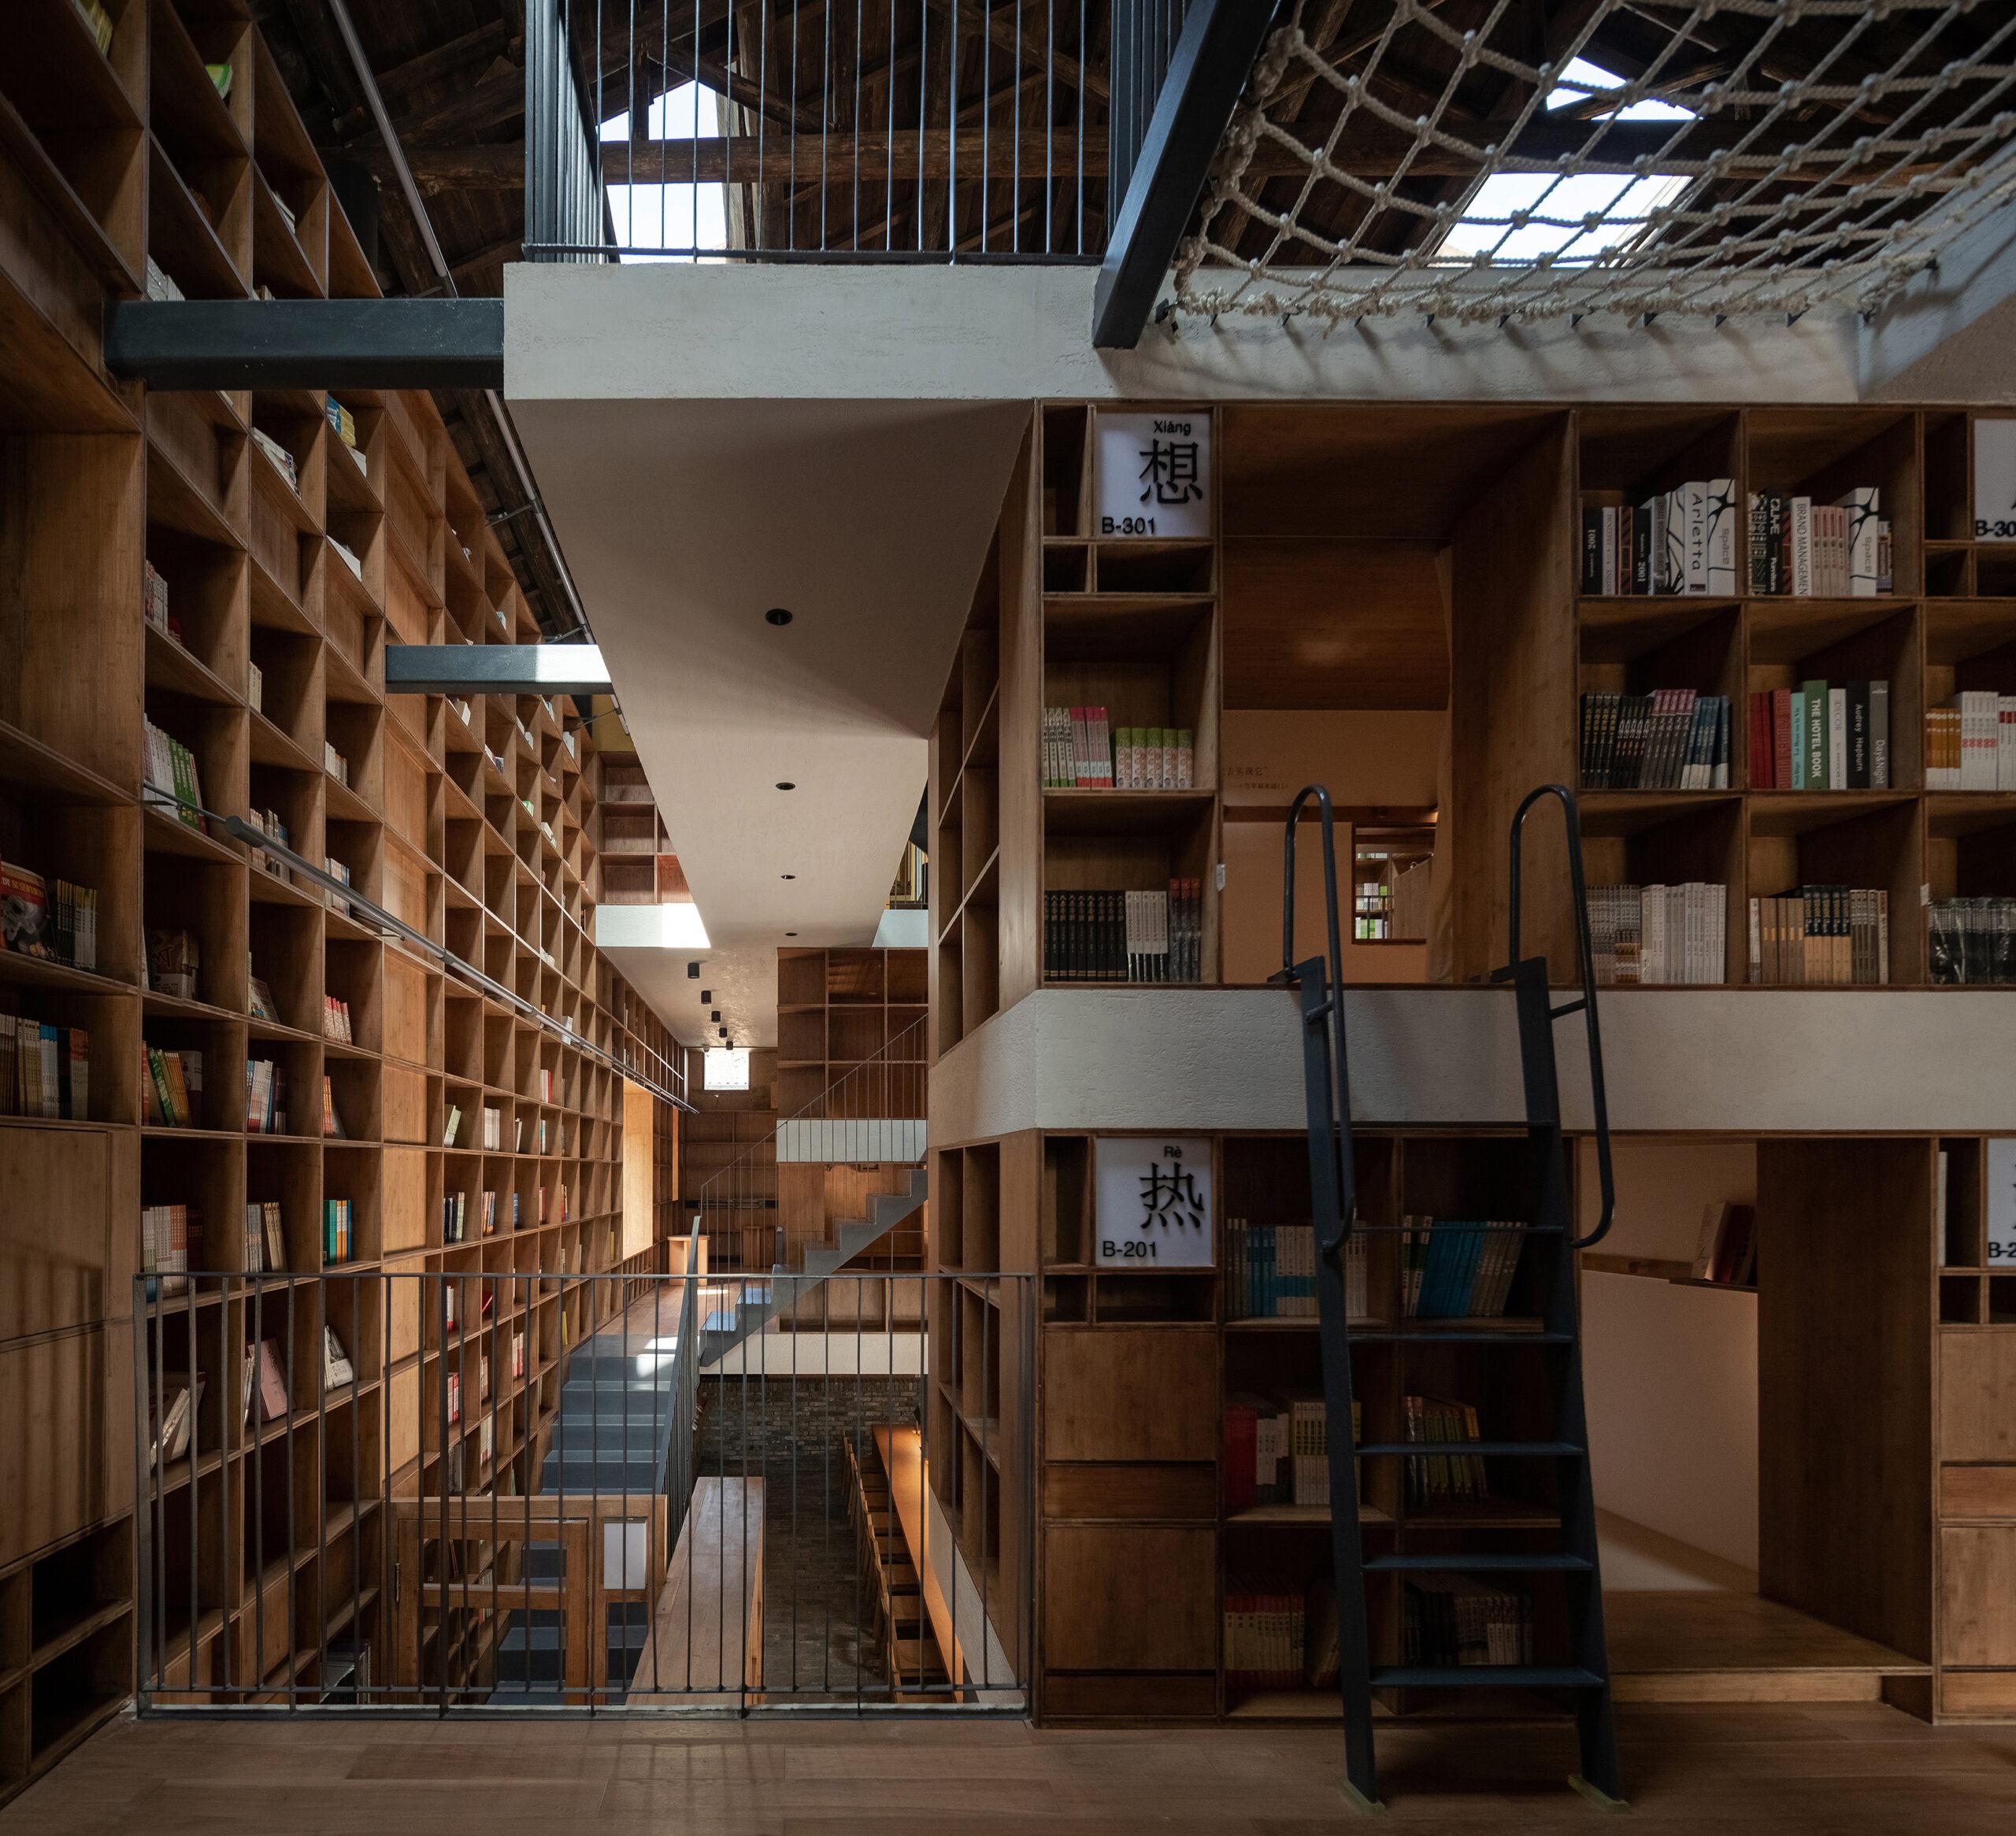 05 Platforms, Bookshelves And Capsules Ateliertaoc ©su Shengliang